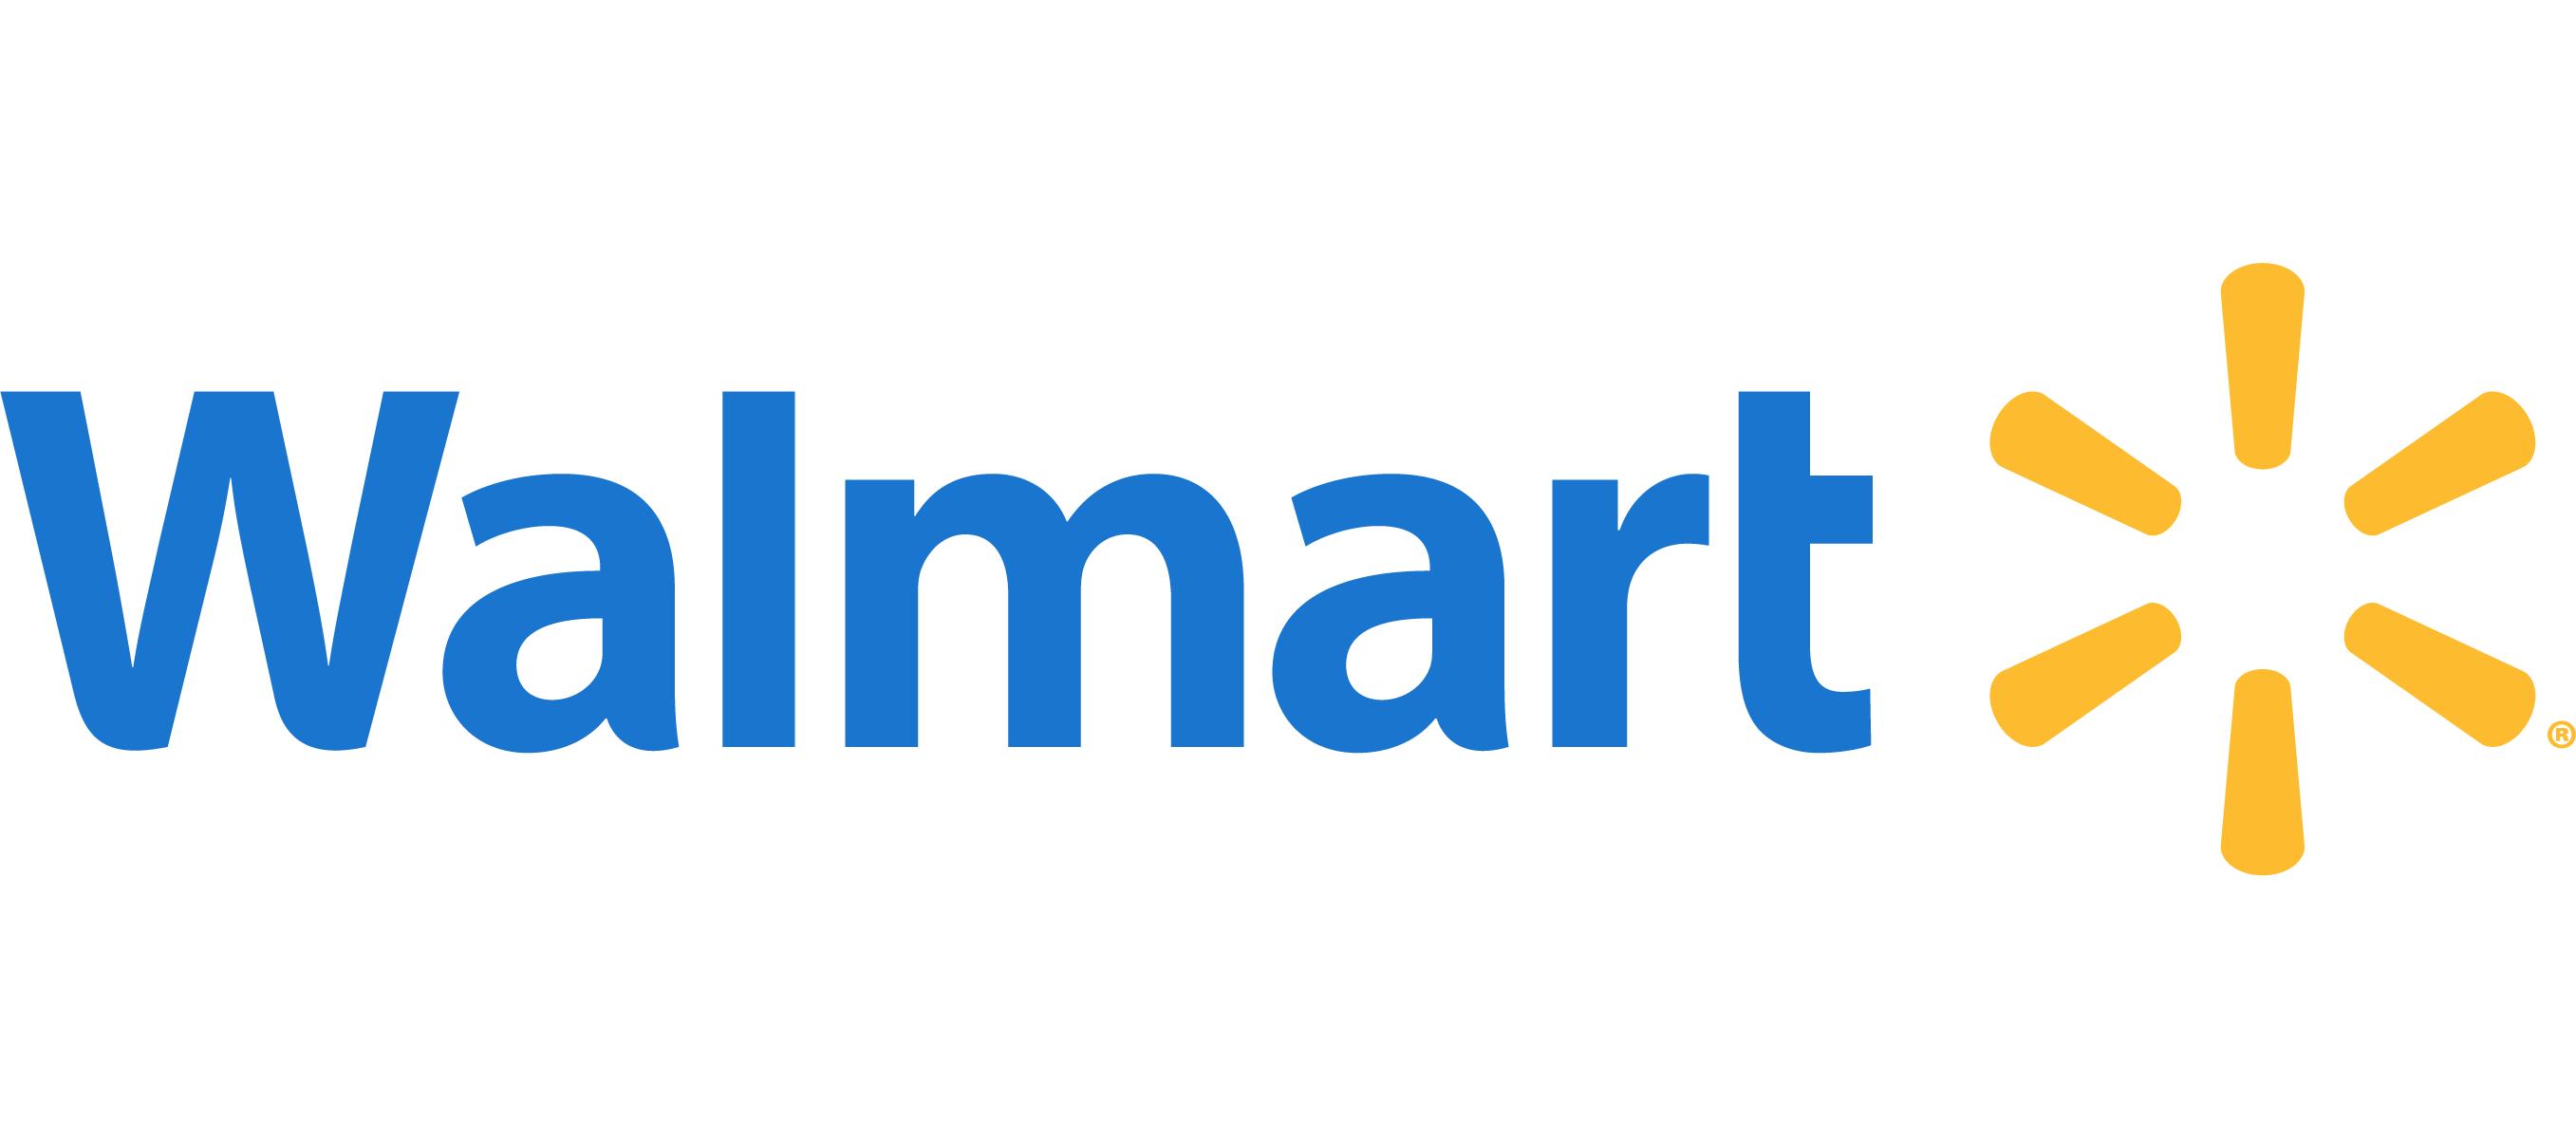 Blue Walmart stores logo